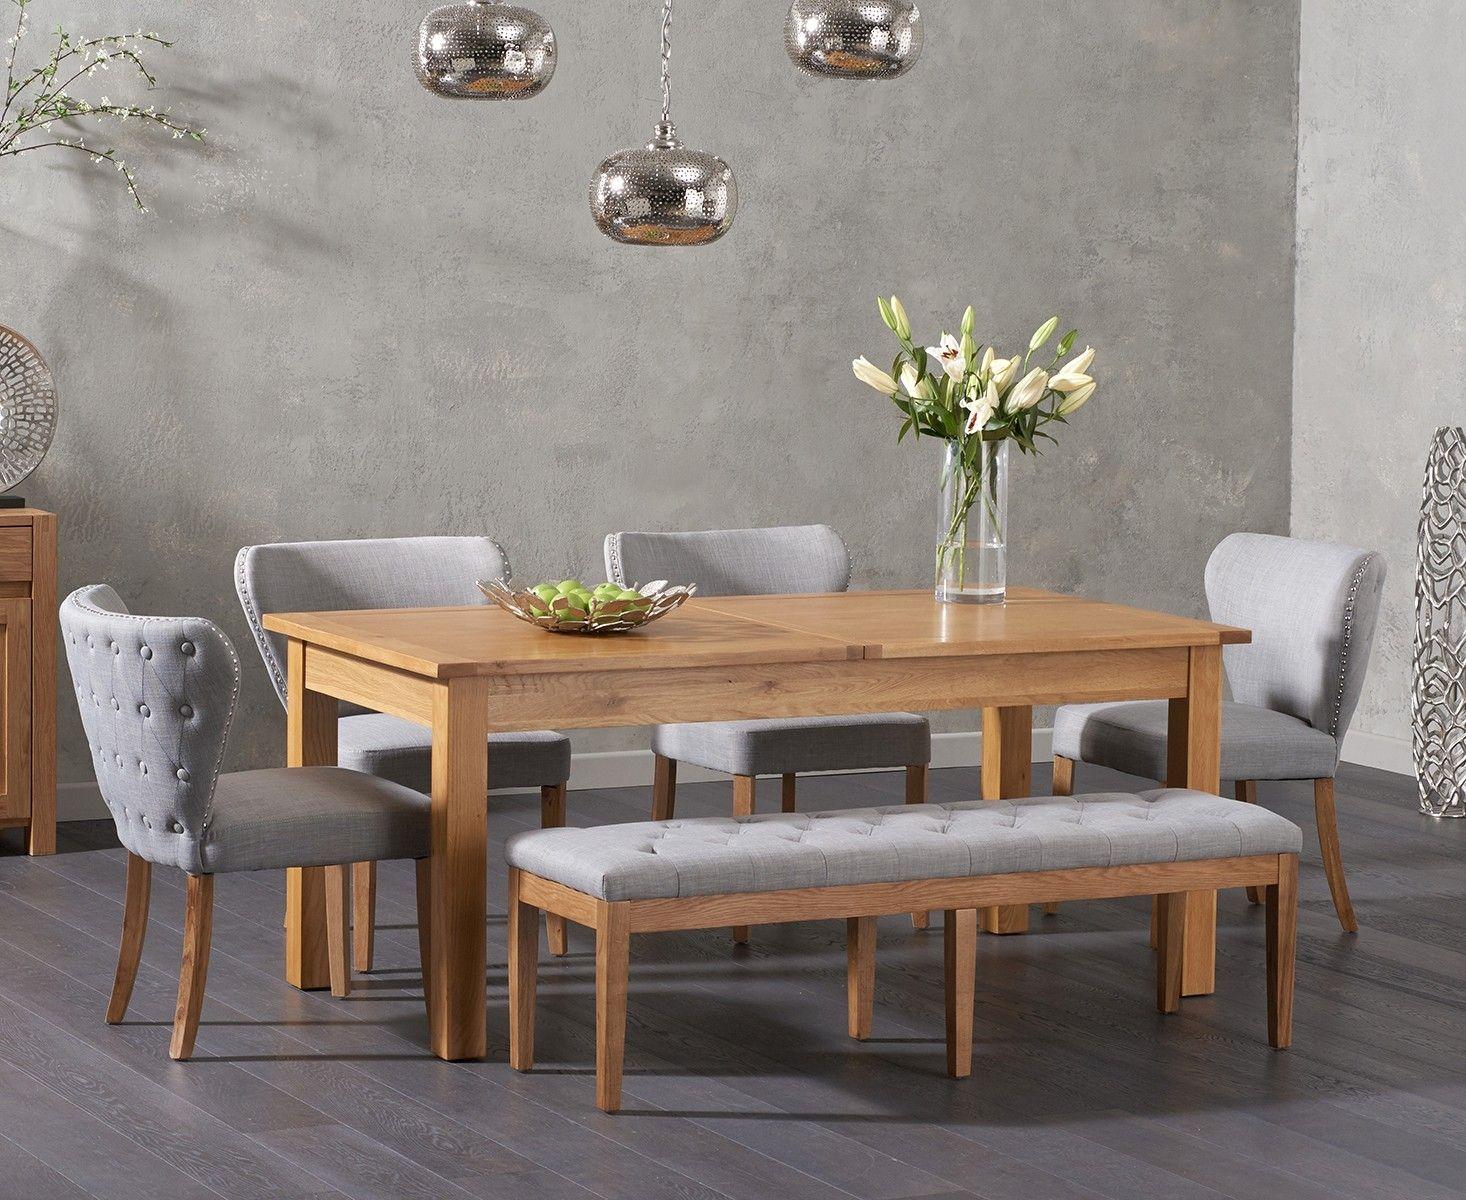 Fine Somerset 180Cm Oak Extending Dining Table With Isobel Chairs Creativecarmelina Interior Chair Design Creativecarmelinacom